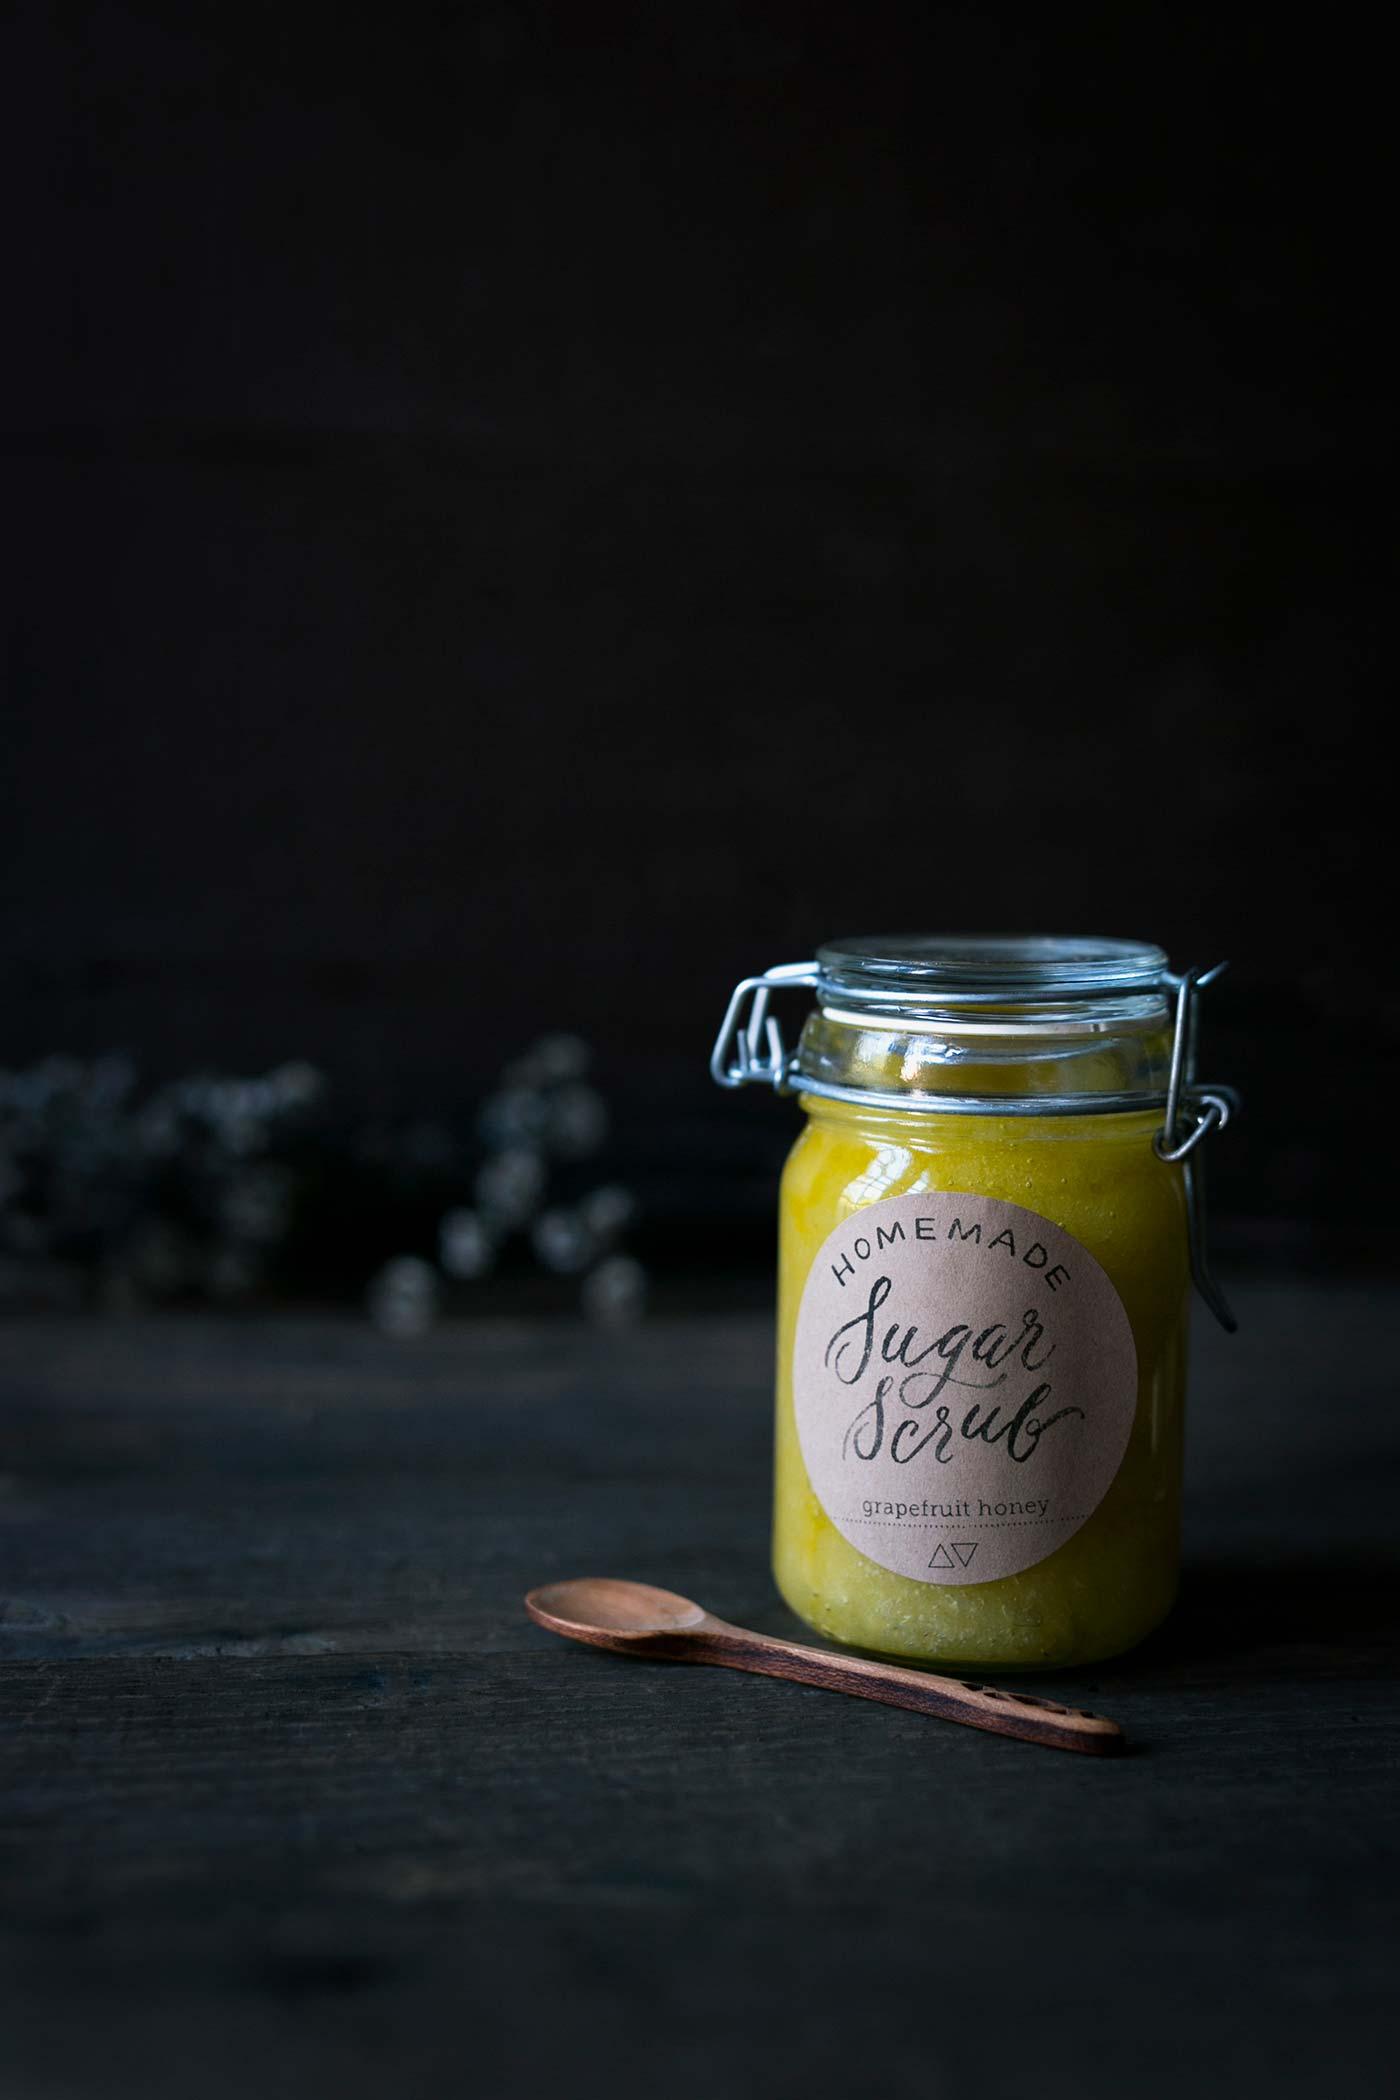 Homemade Sugar Scrub in a mason jar